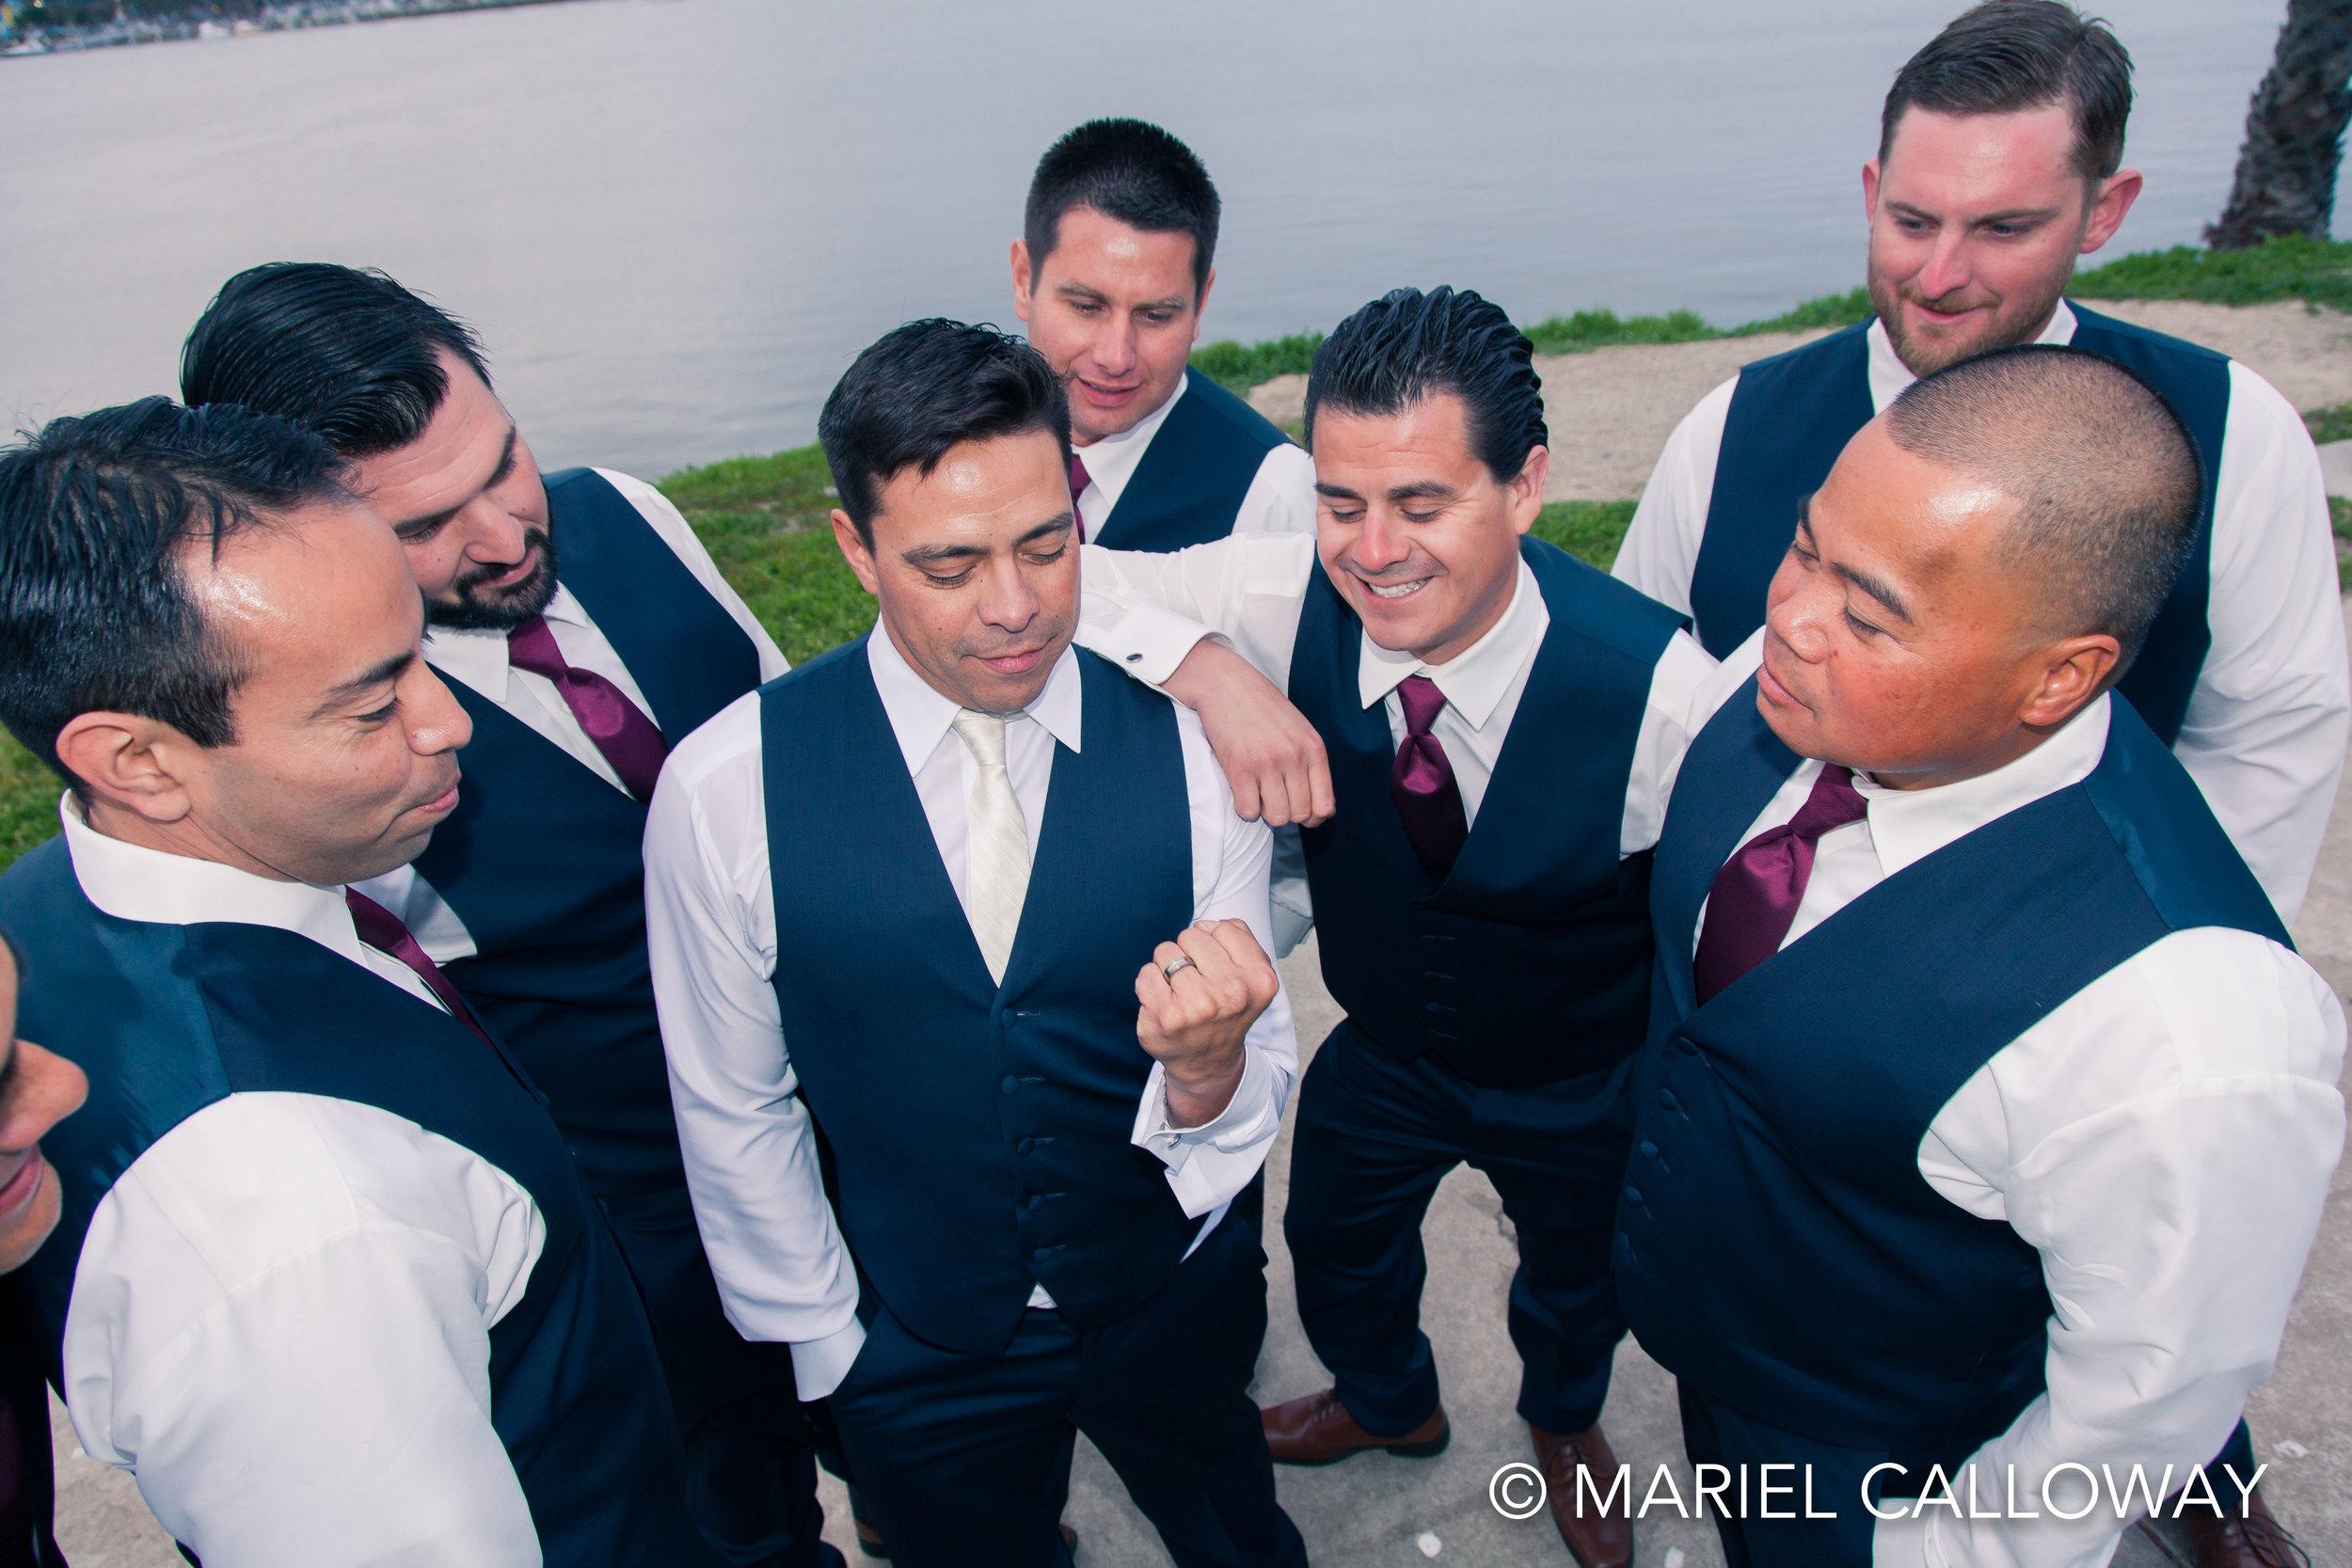 Mariel-Calloway-Los-Angeles-Wedding-Photography-Carmona-26.jpg